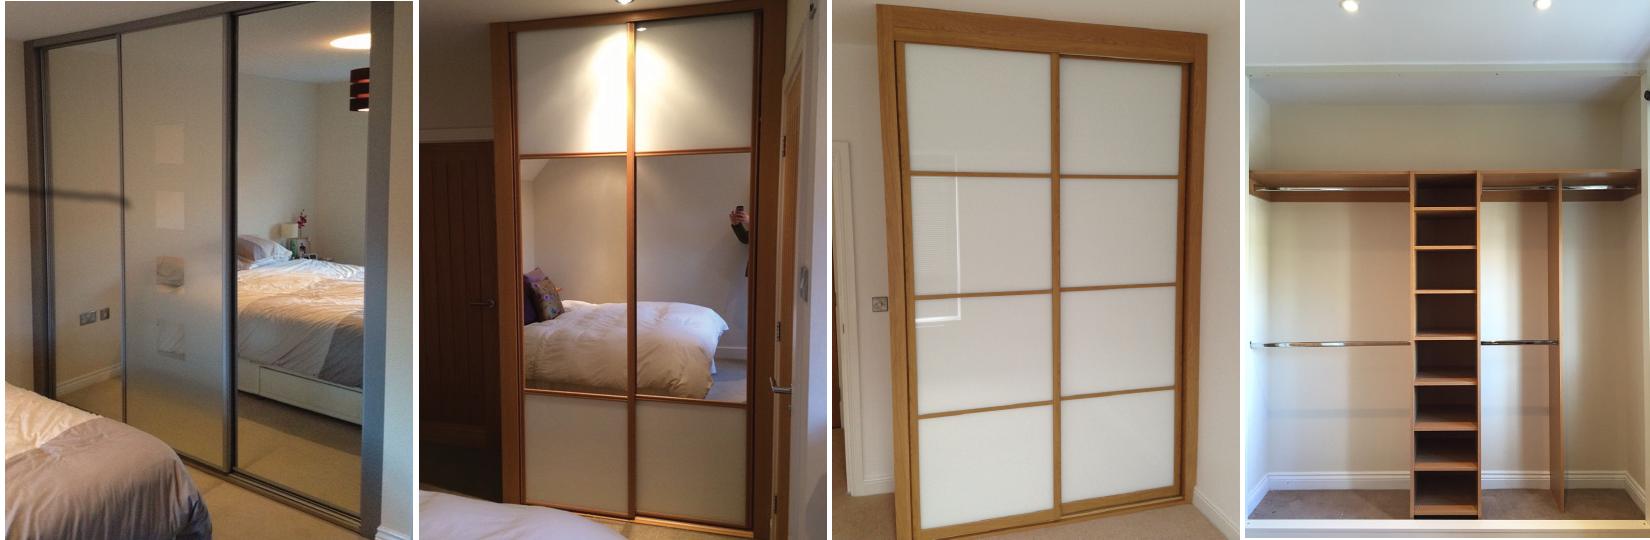 Banner3 - sliding wardrobe doors